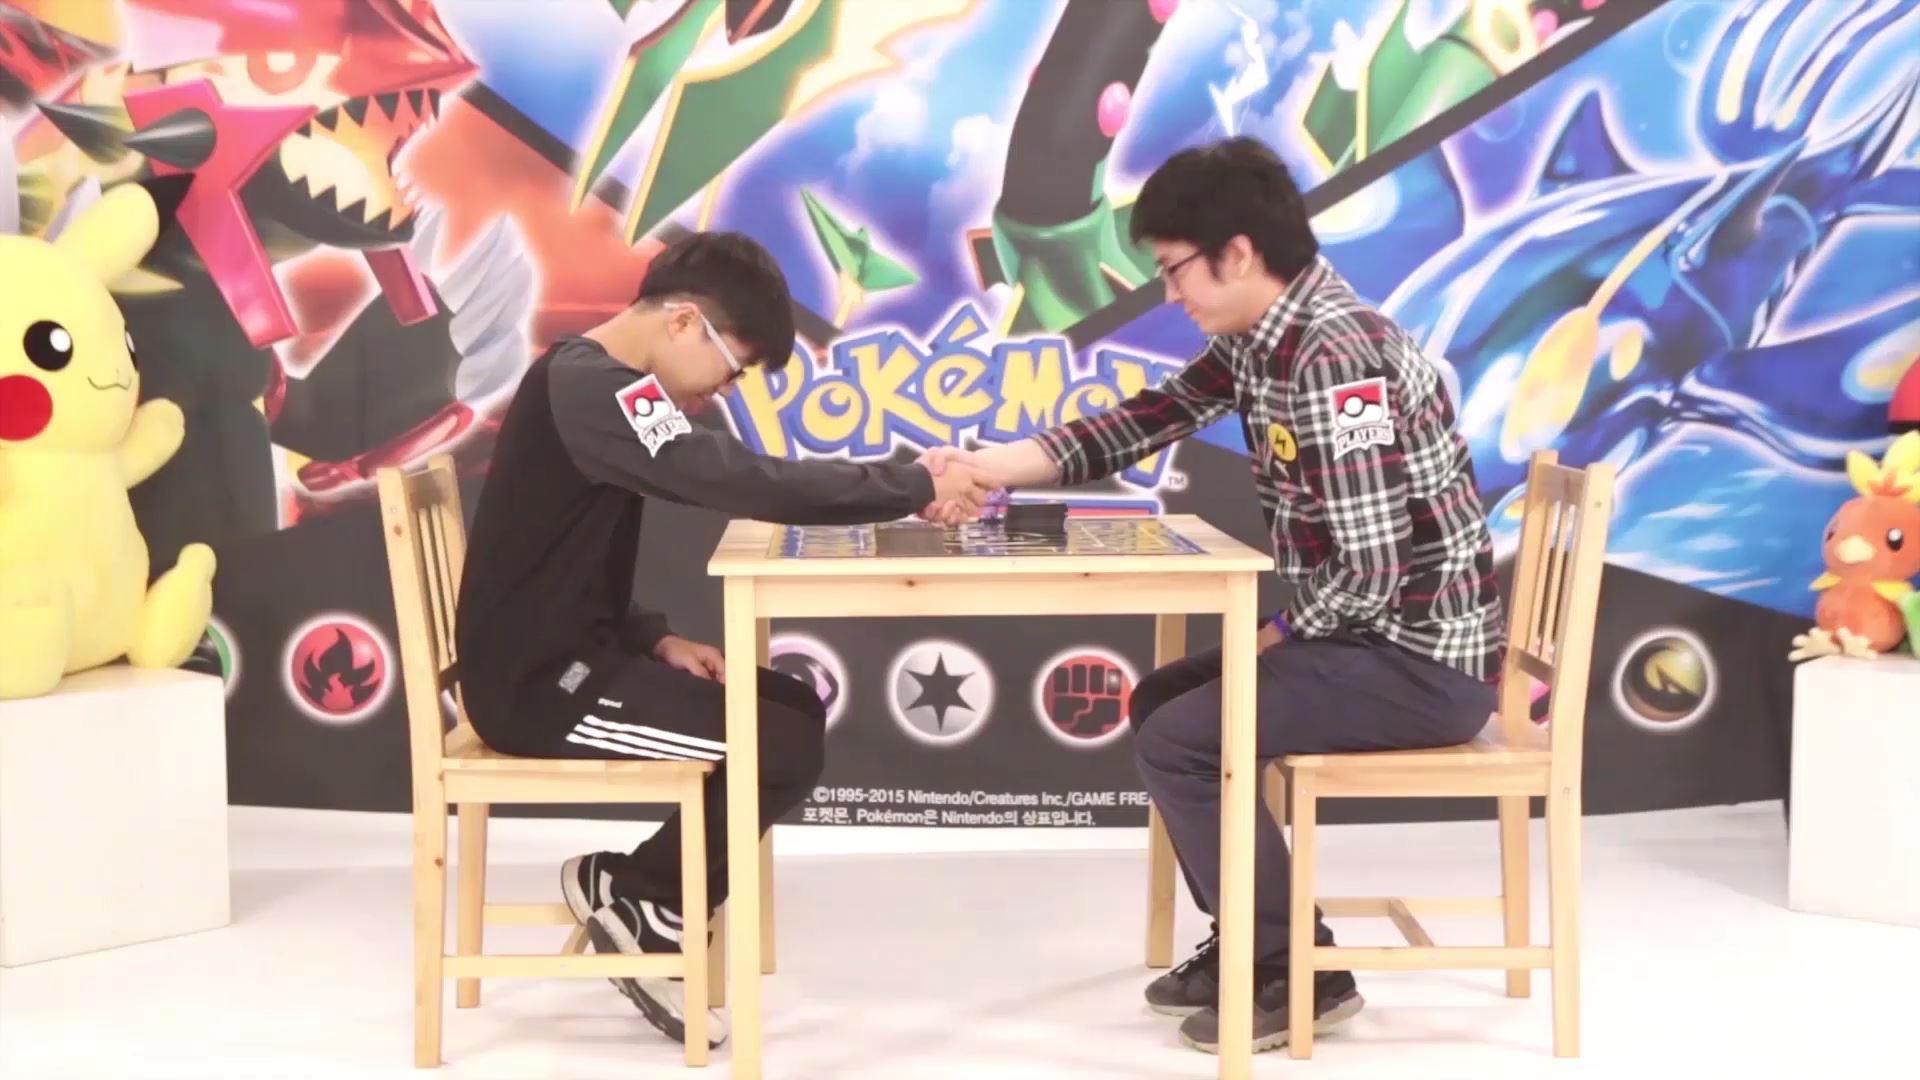 PLAYER 김혁 VS. PLAYER 김건우